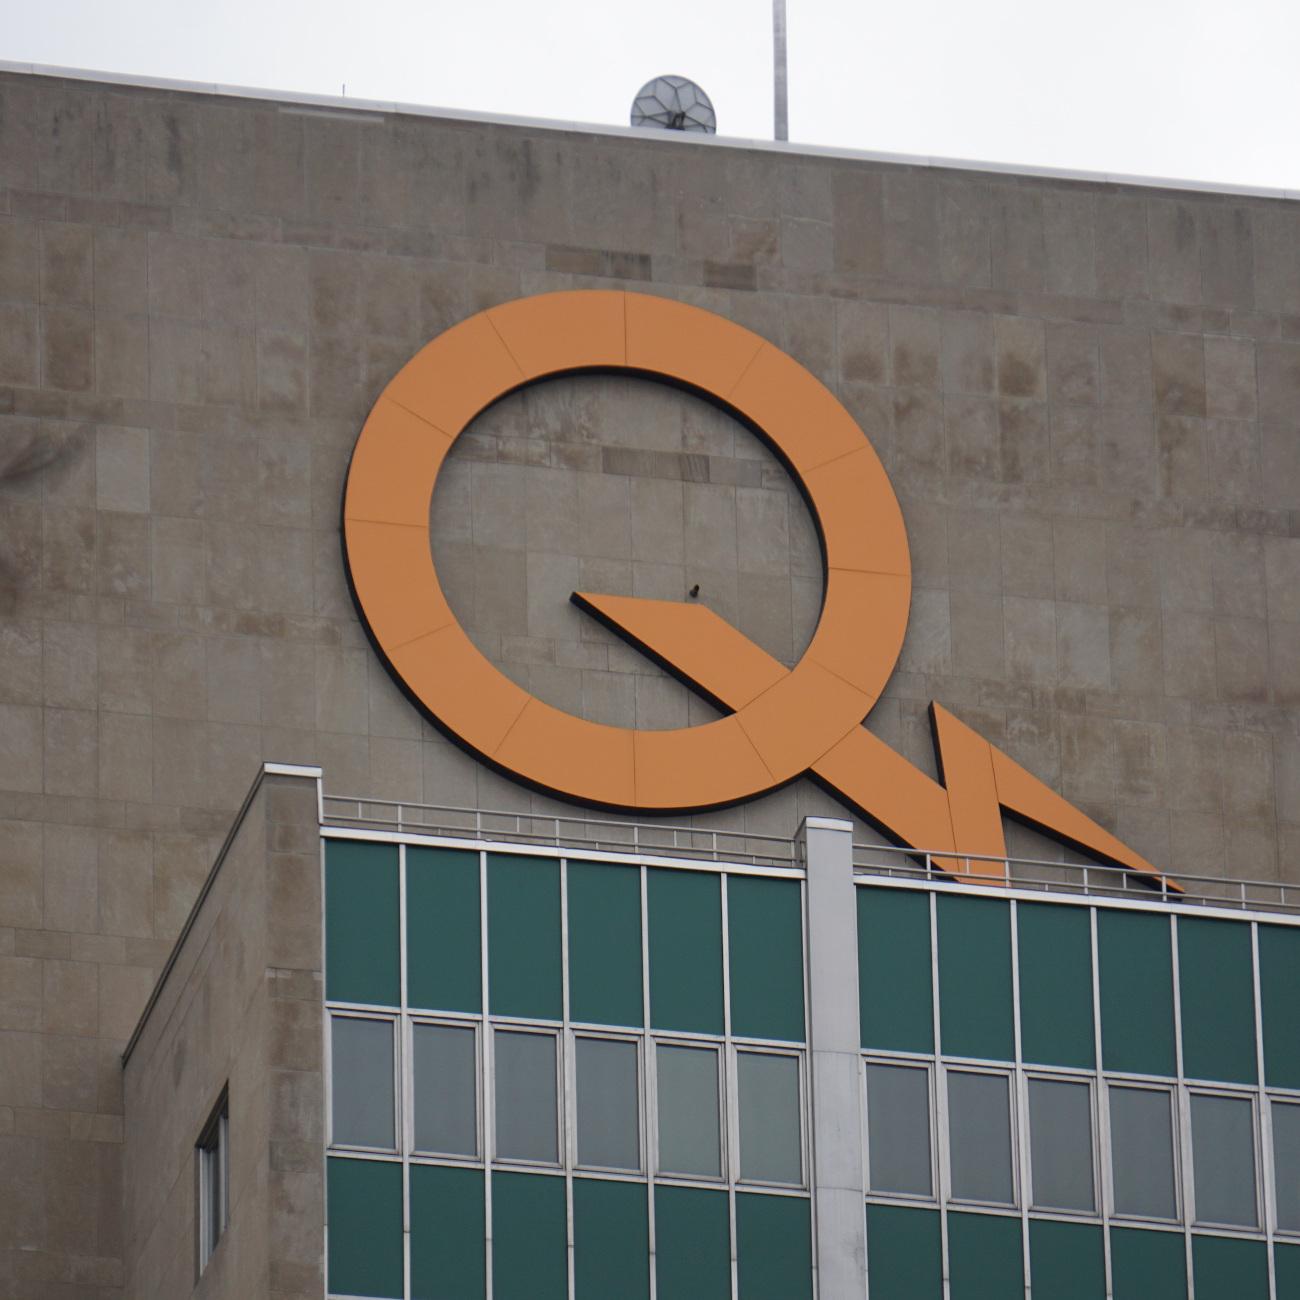 Enseigne Hydro-Québec